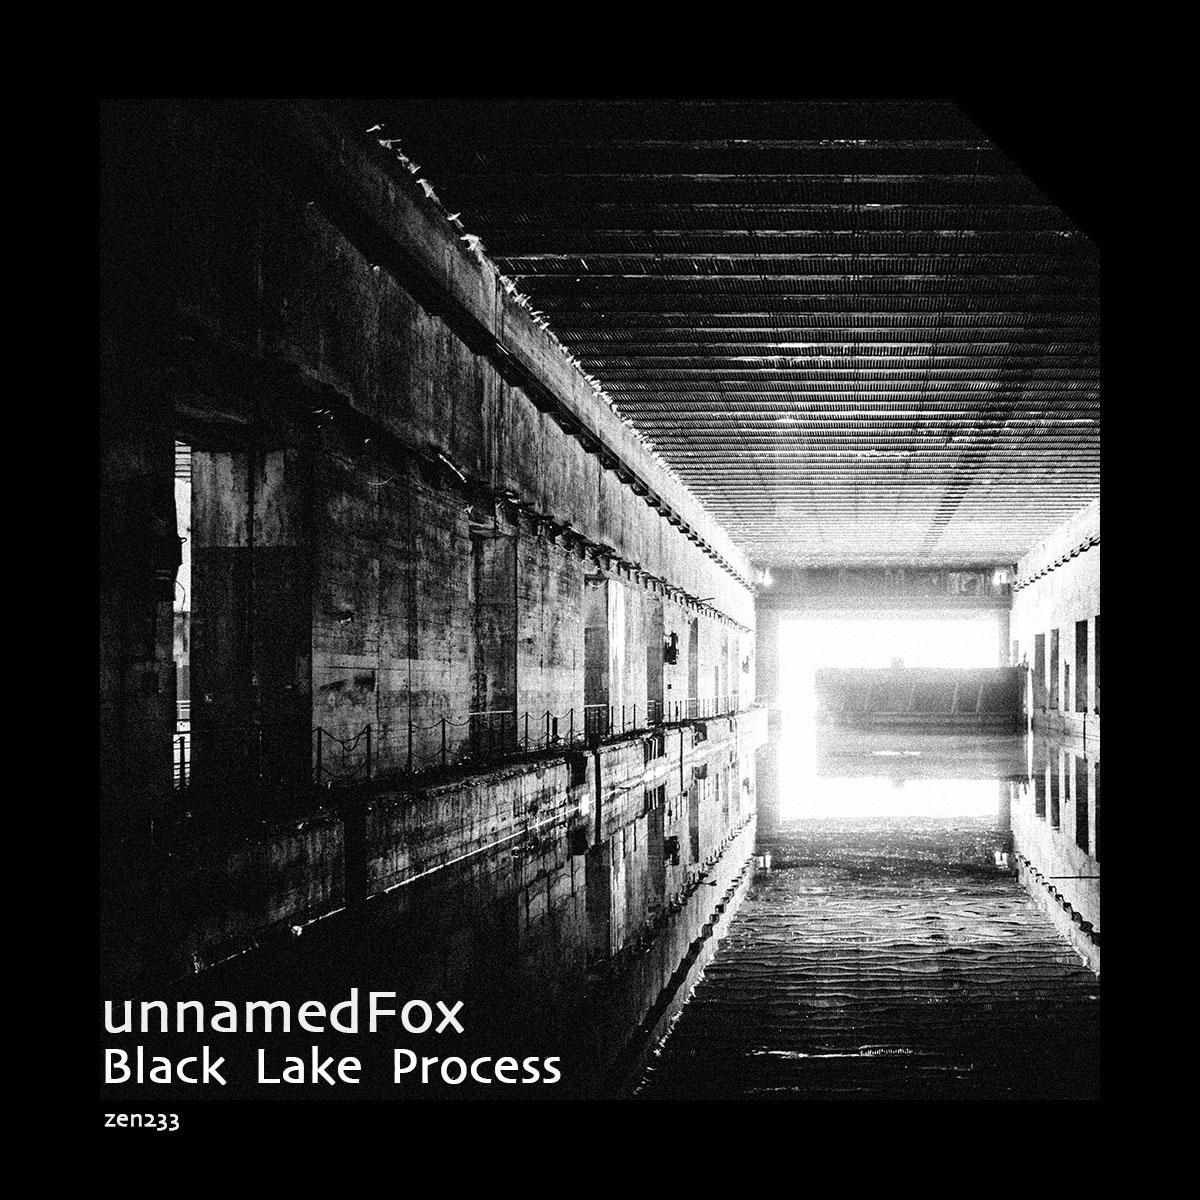 unnamedFox – Black Lake Process